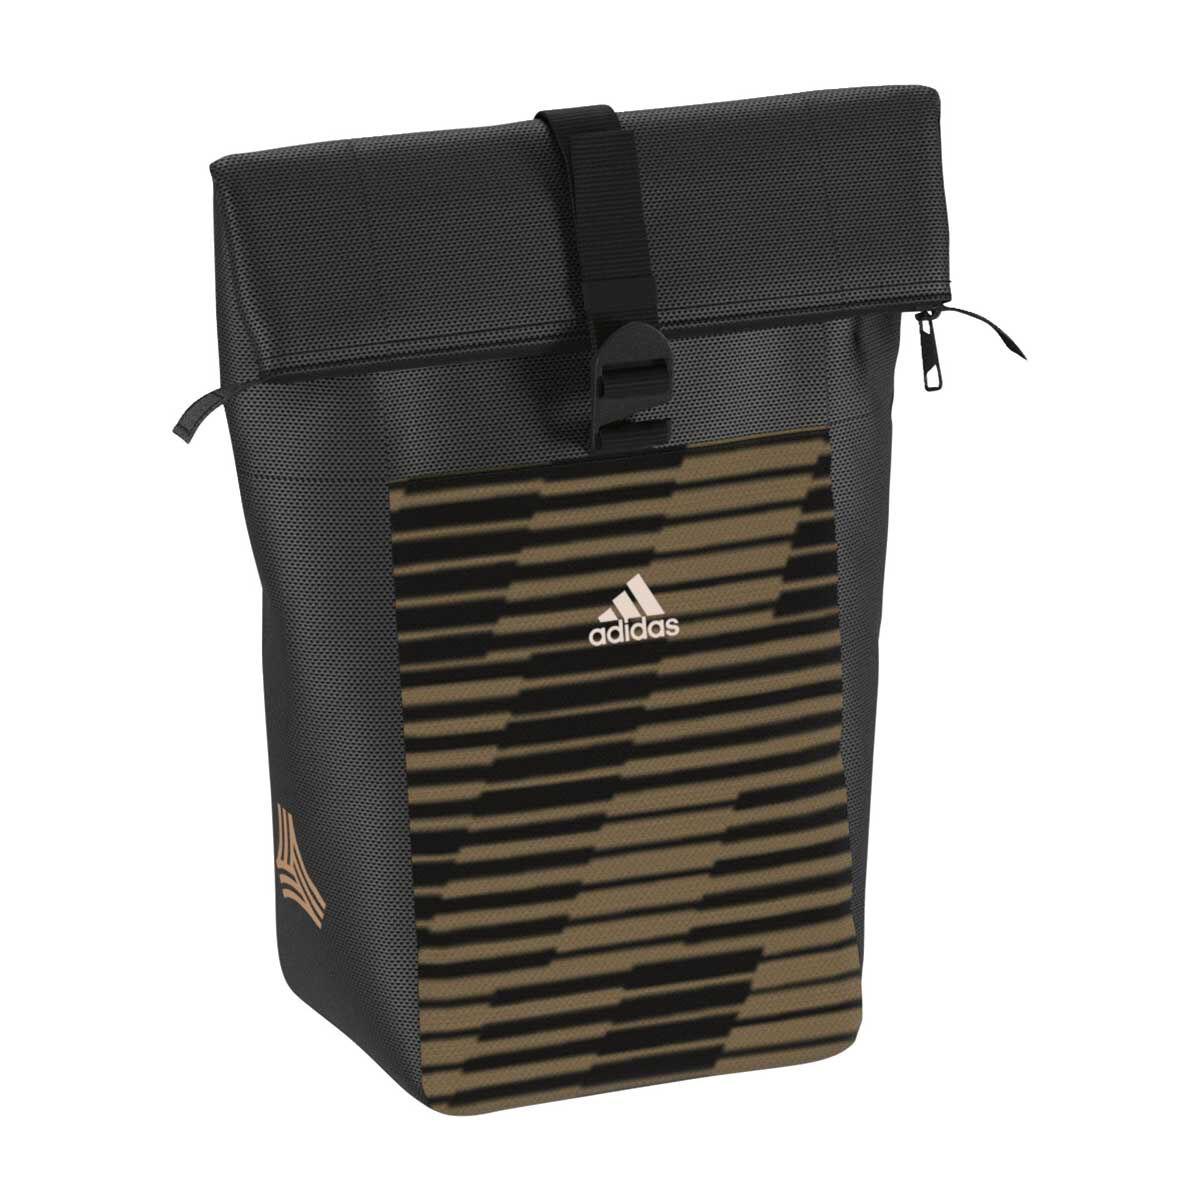 Adidas tango football shoe bag black gold rebel sport jpg 1000x1000 Football  shoe bags 4a562760979b1